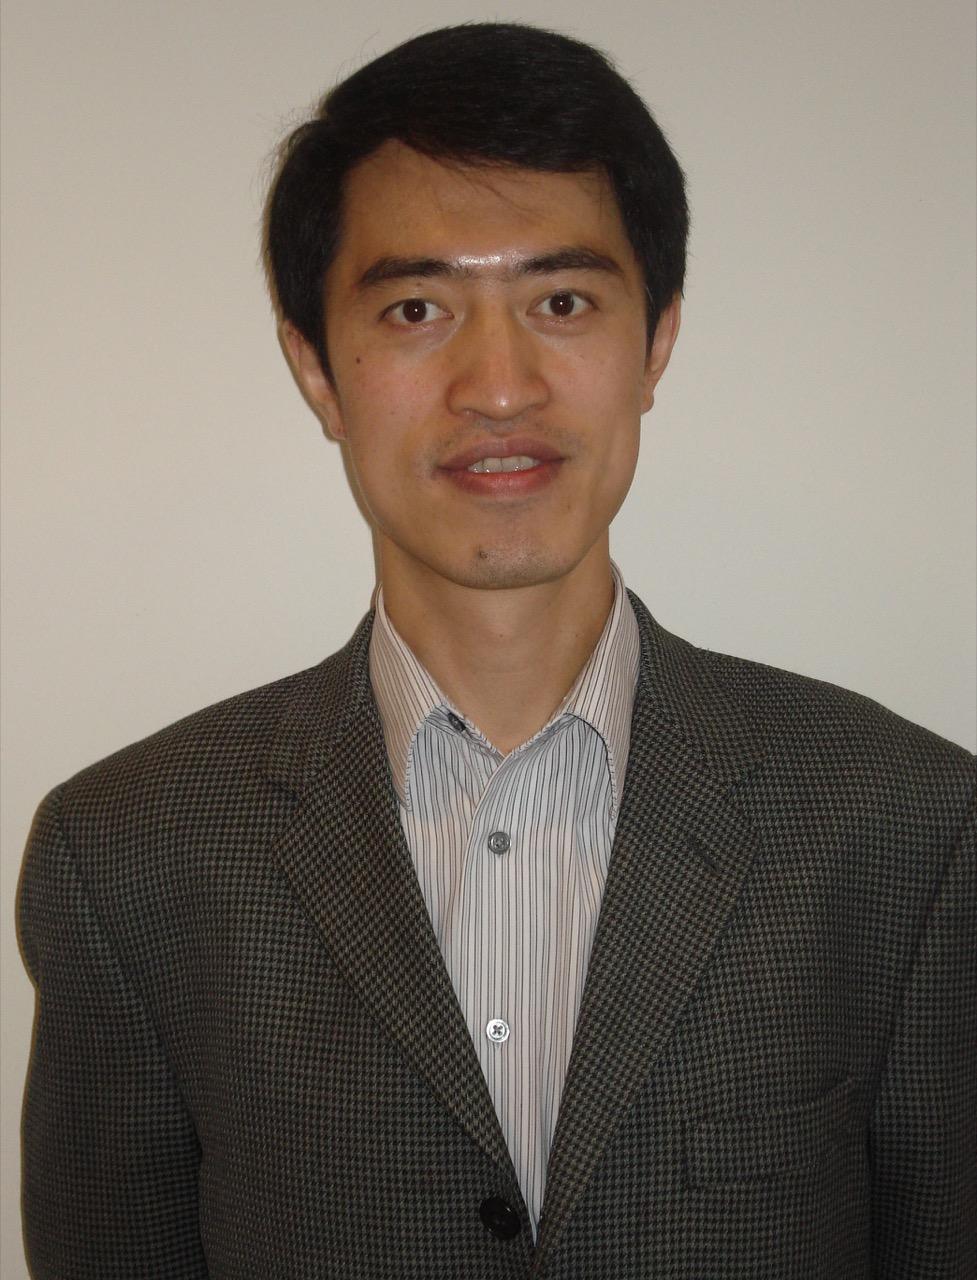 Samuel Kou